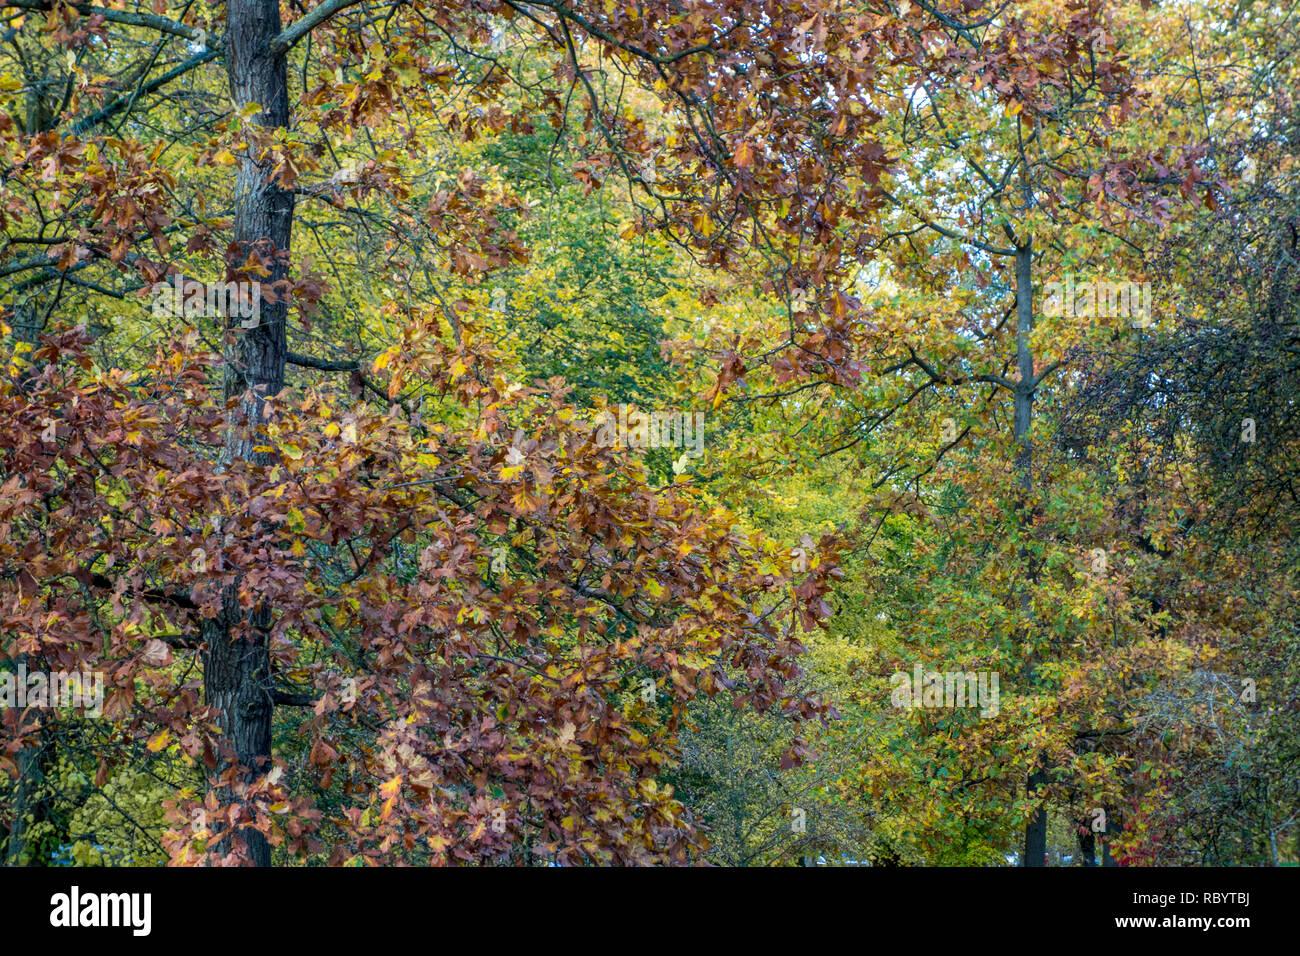 Autumn trees, Autumn foliage, autumn leaves - Stock Image